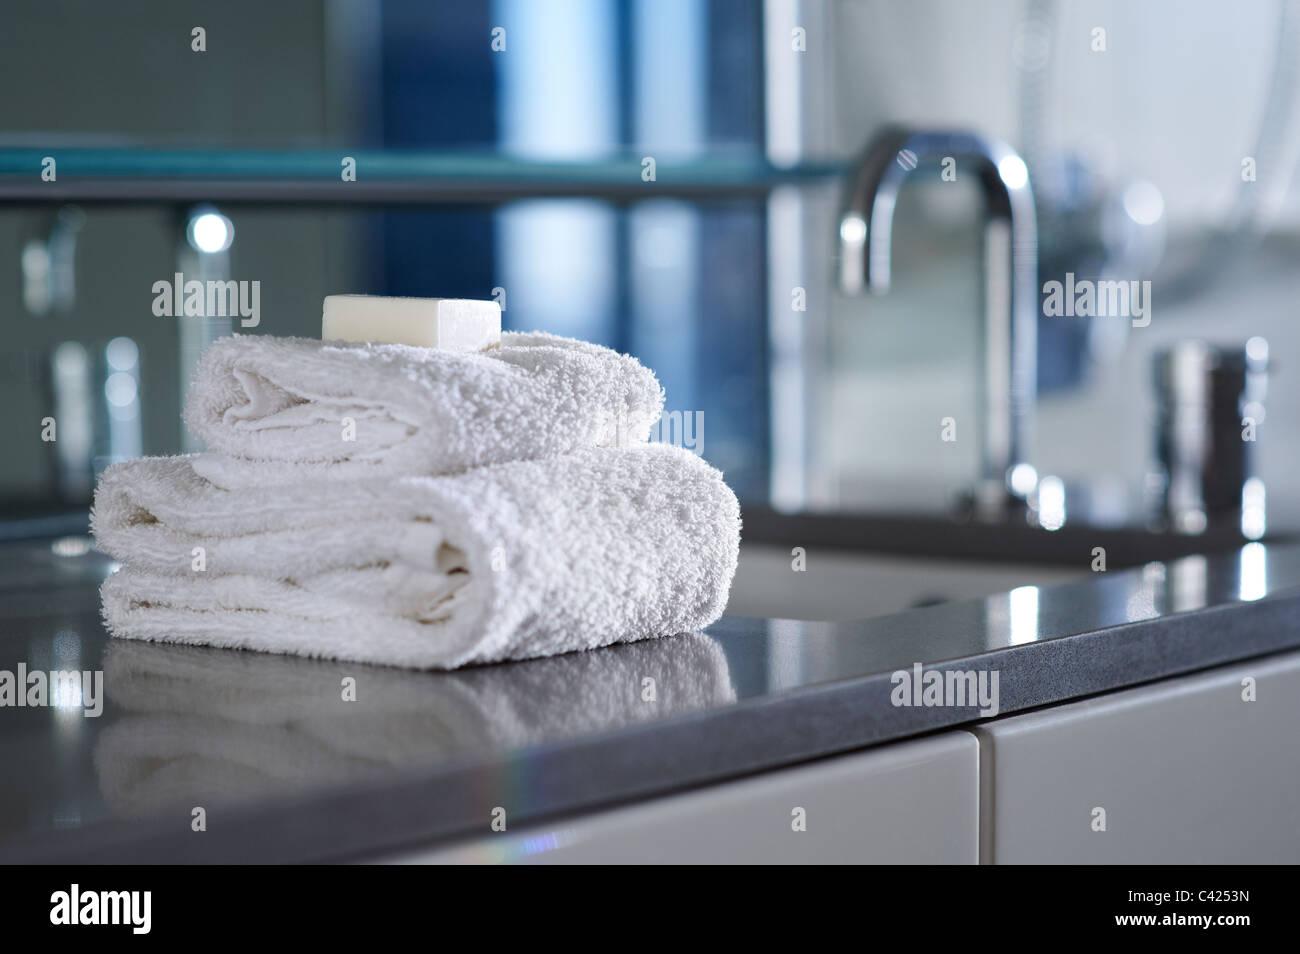 Bathroom - Stock Image